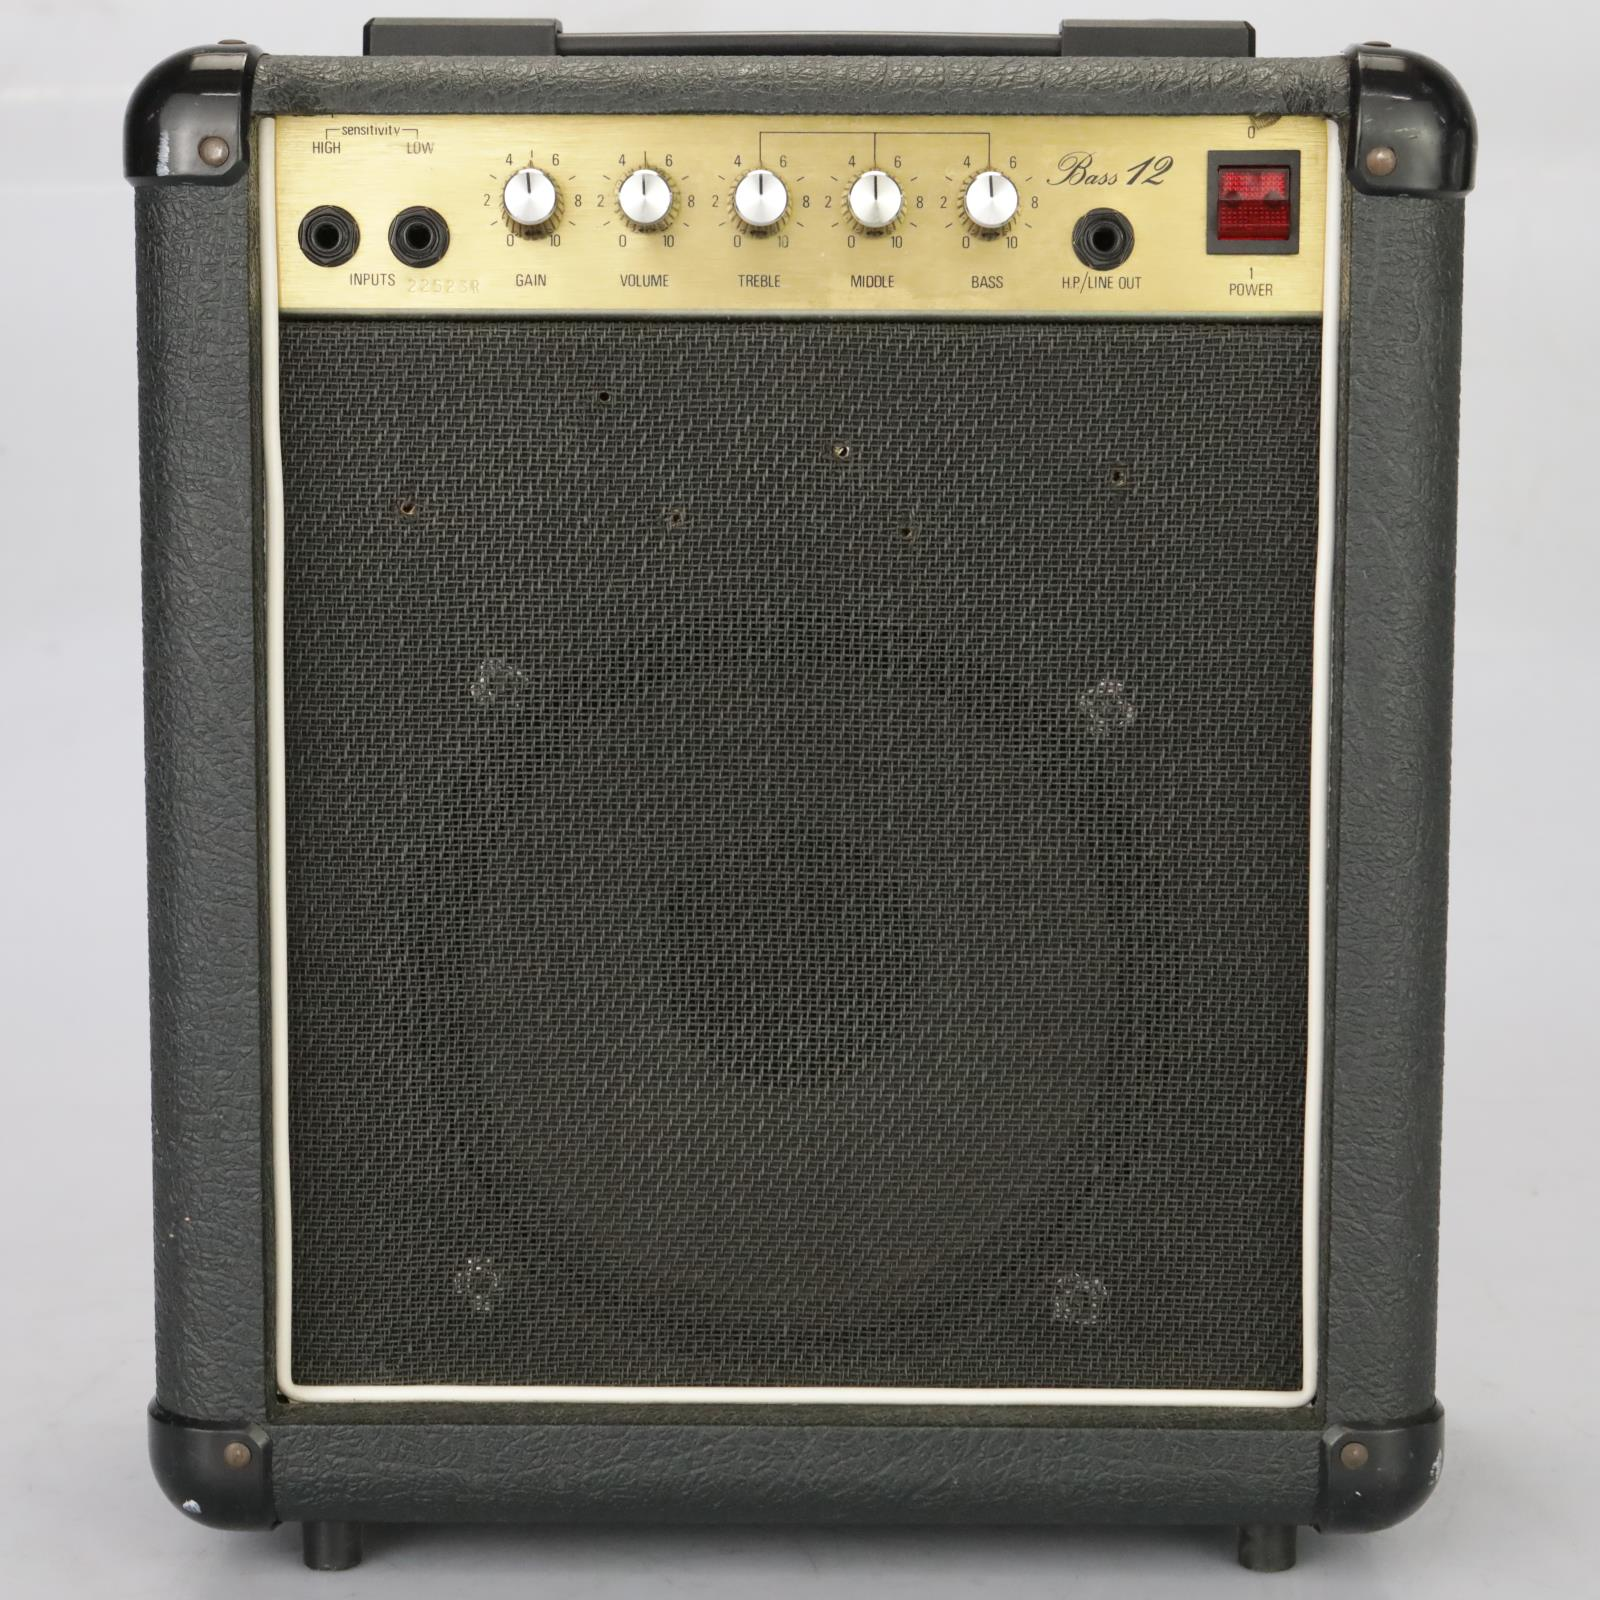 "1983 Marshall Model 5501 Bass 12 12w 1x10"" Combo Amplifier Practice Amp #38004"